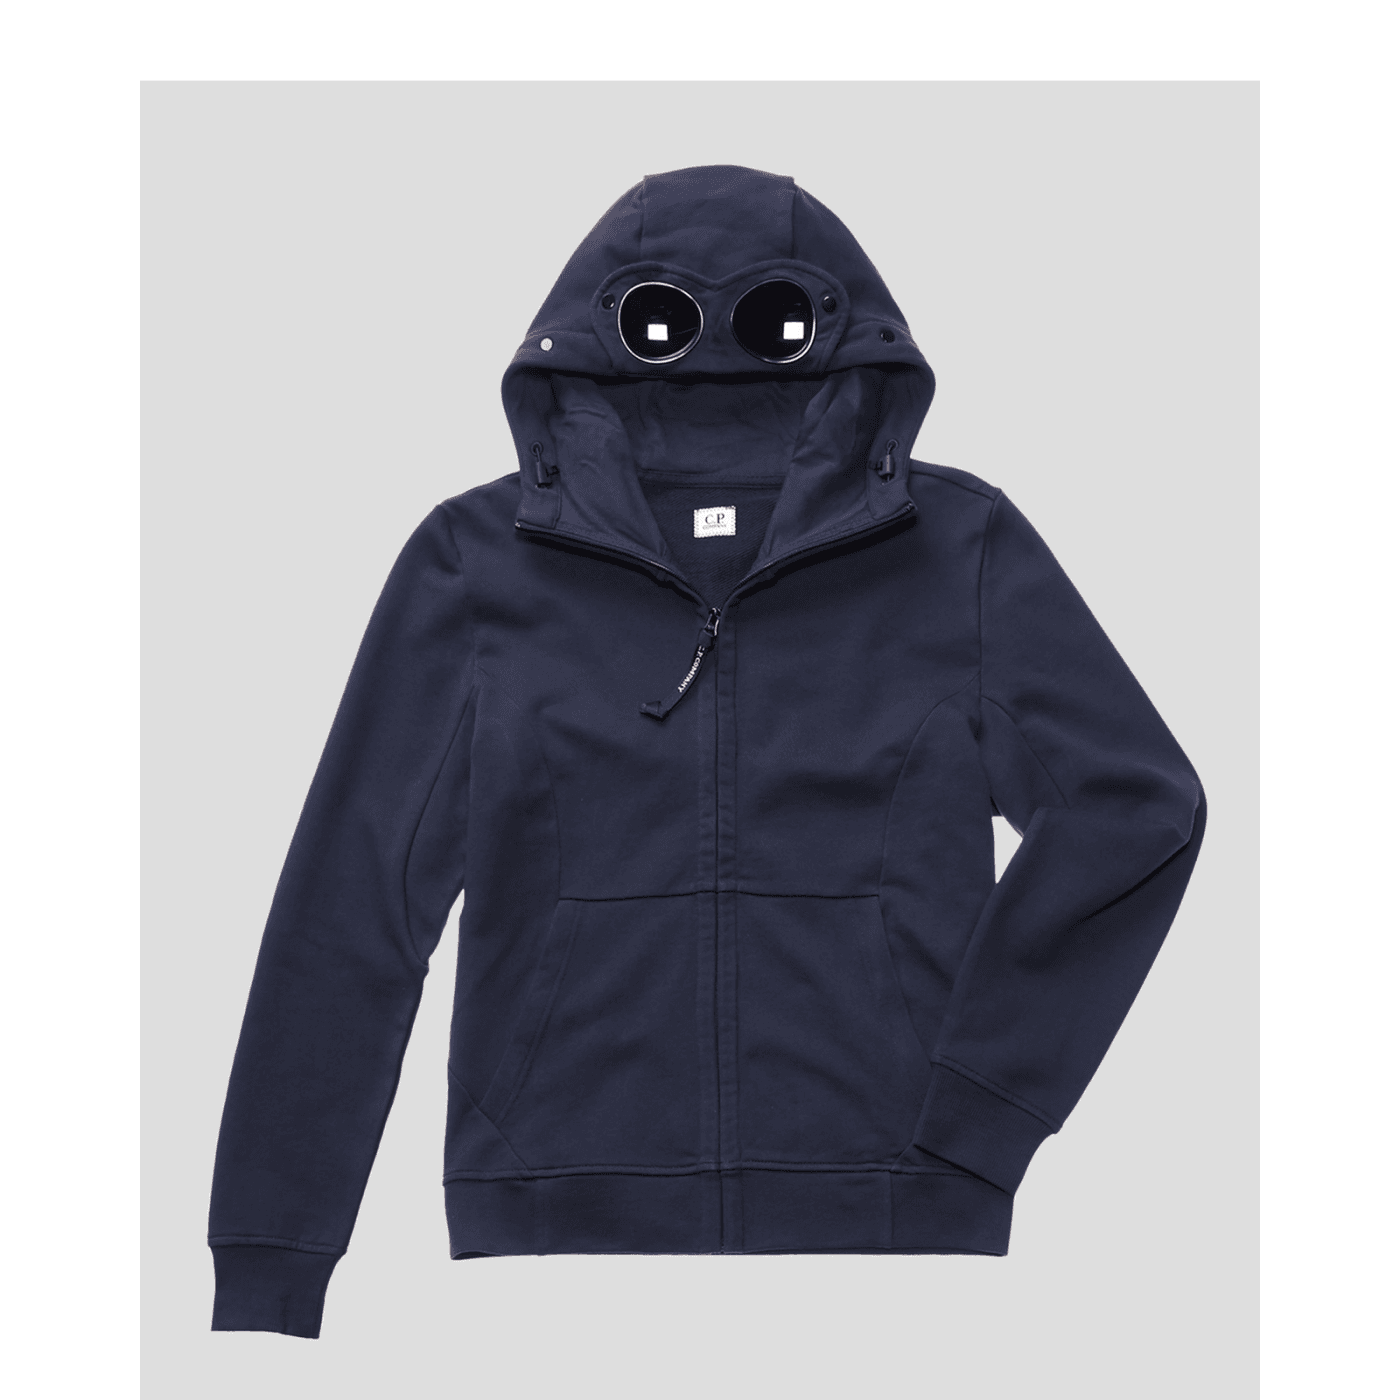 Sweat CP Company diagonal fleece open hooded navy